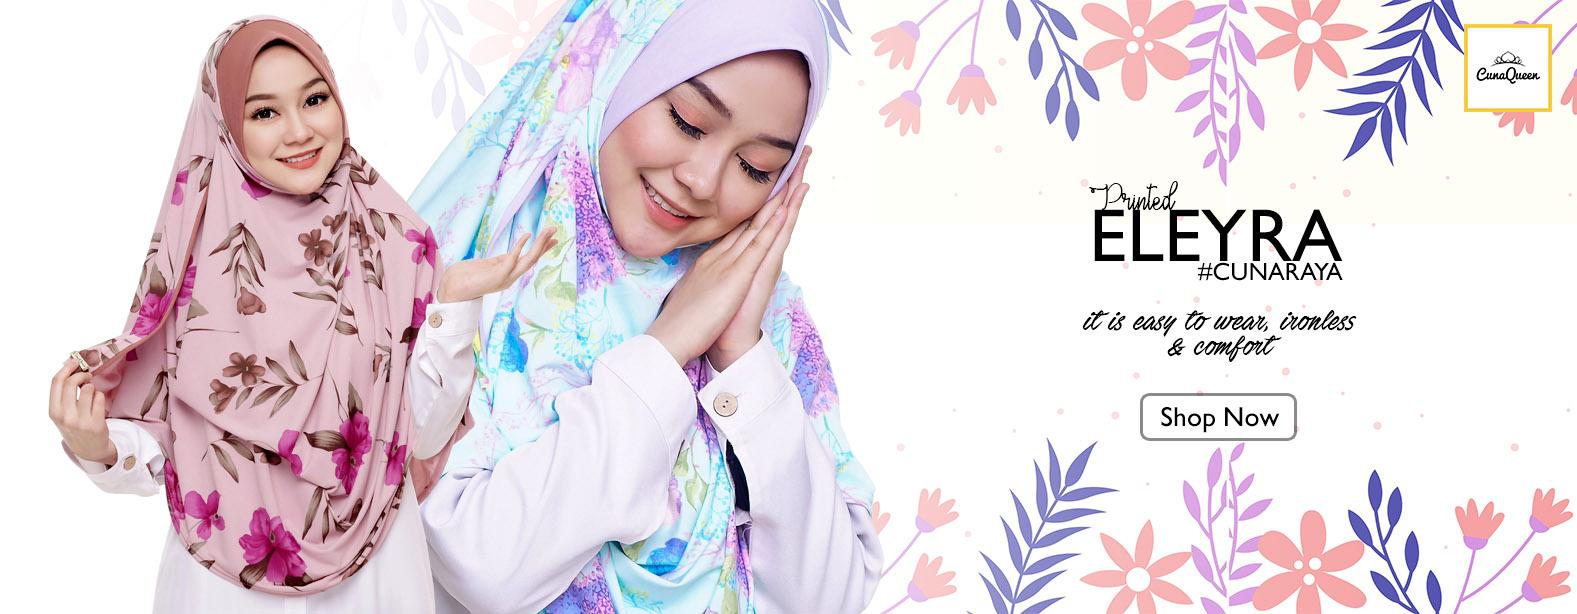 shawl-instant-labuh-raya-printed-ironless